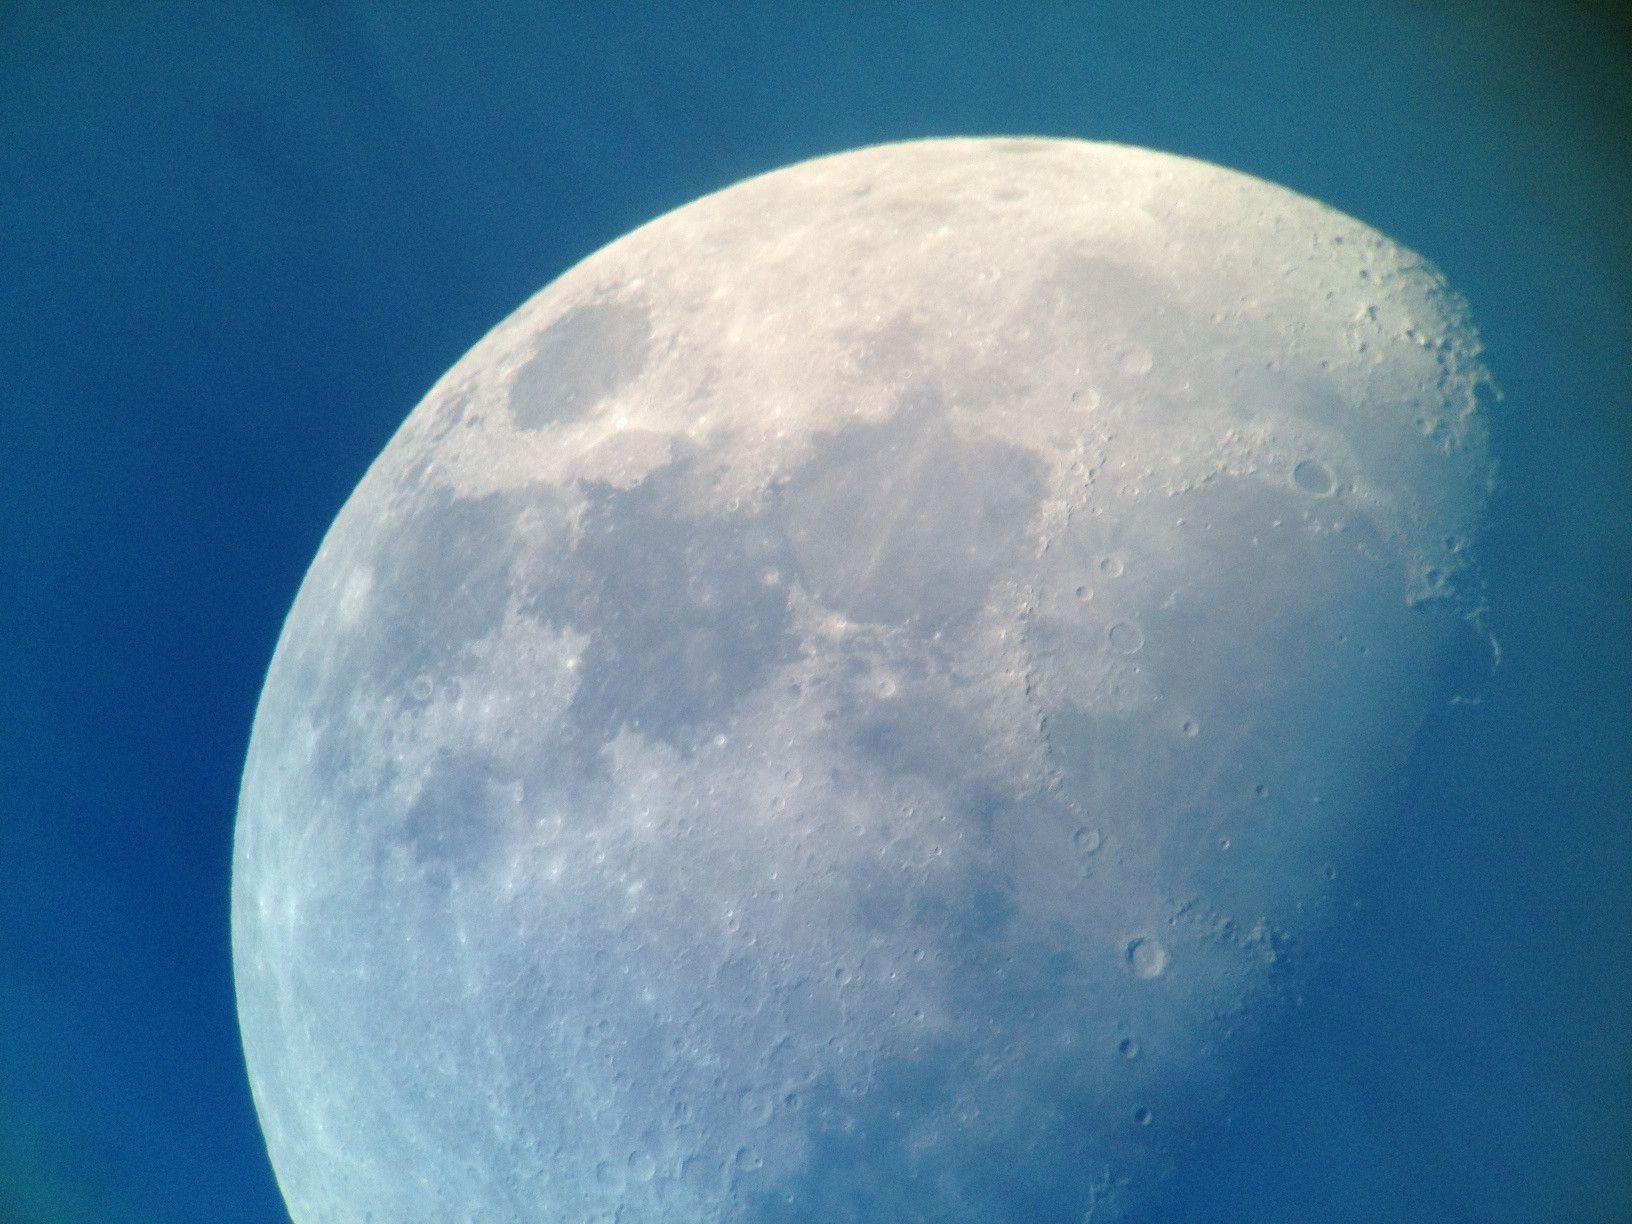 Moon close up cool things pinterest - Moon close up ...